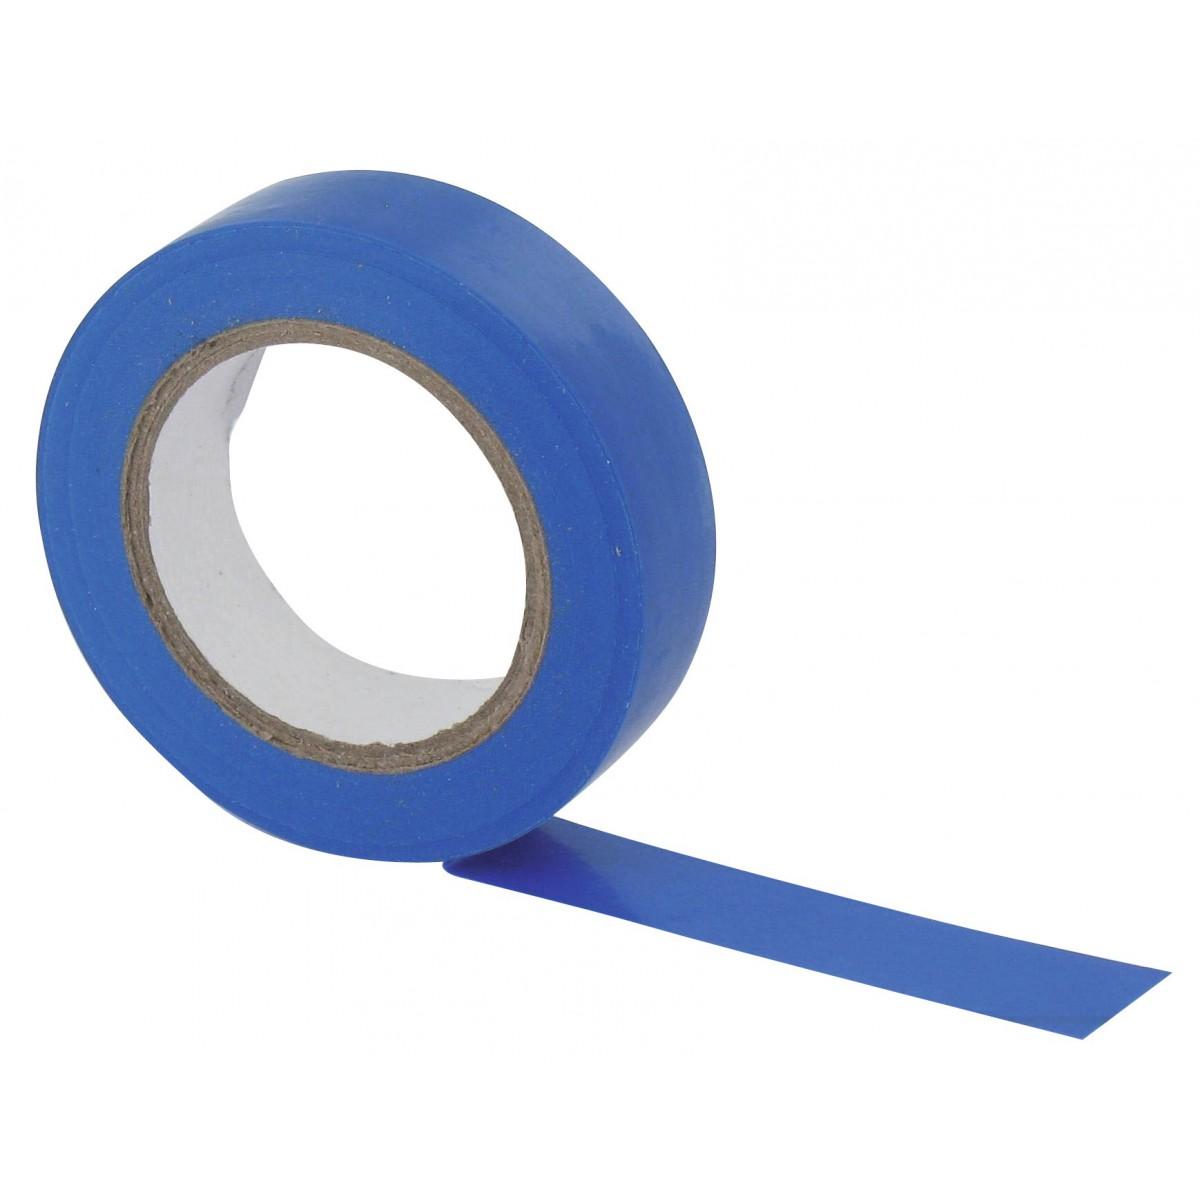 Ruban adhésif isolant Dhome - Bleu